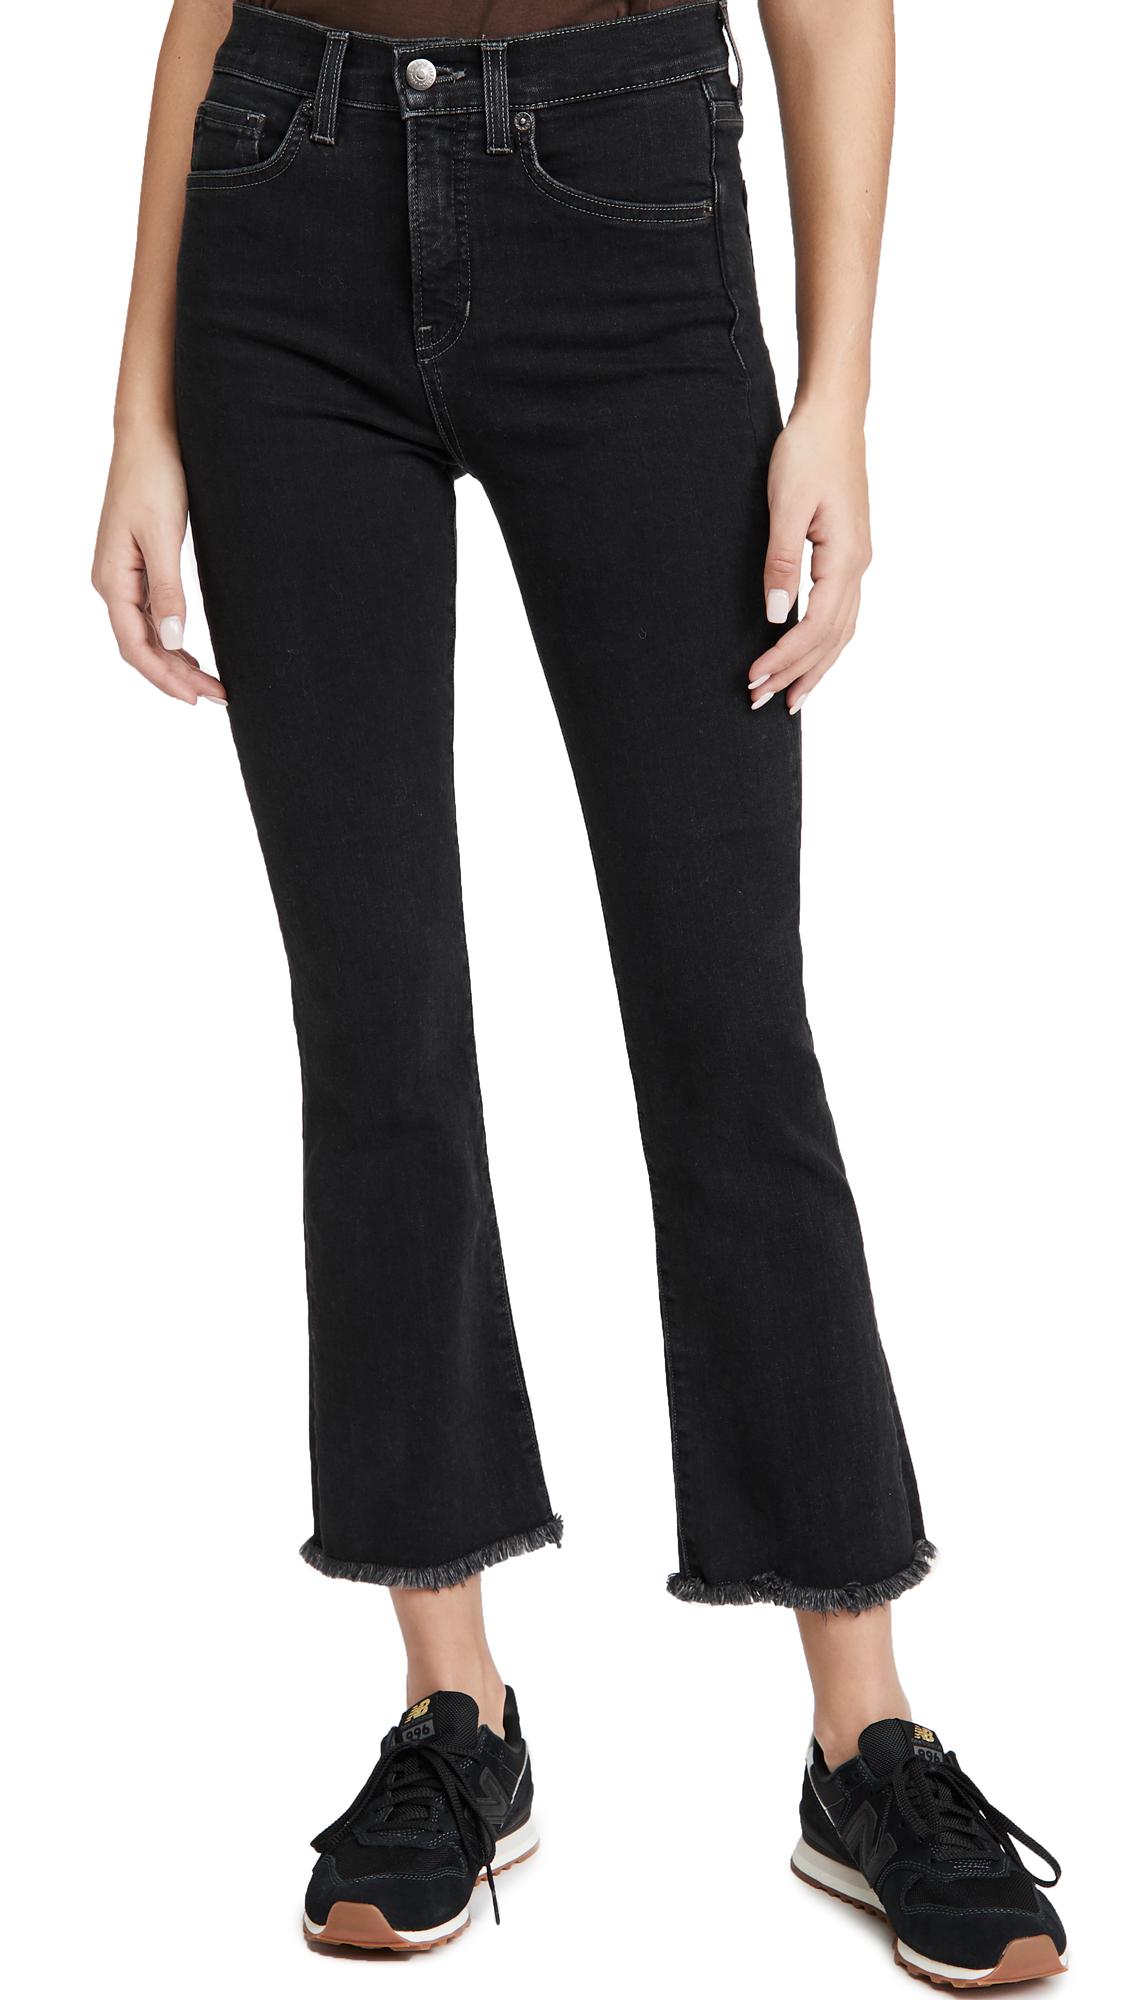 Veronica Beard Jean Carly Kick Flare Jeans